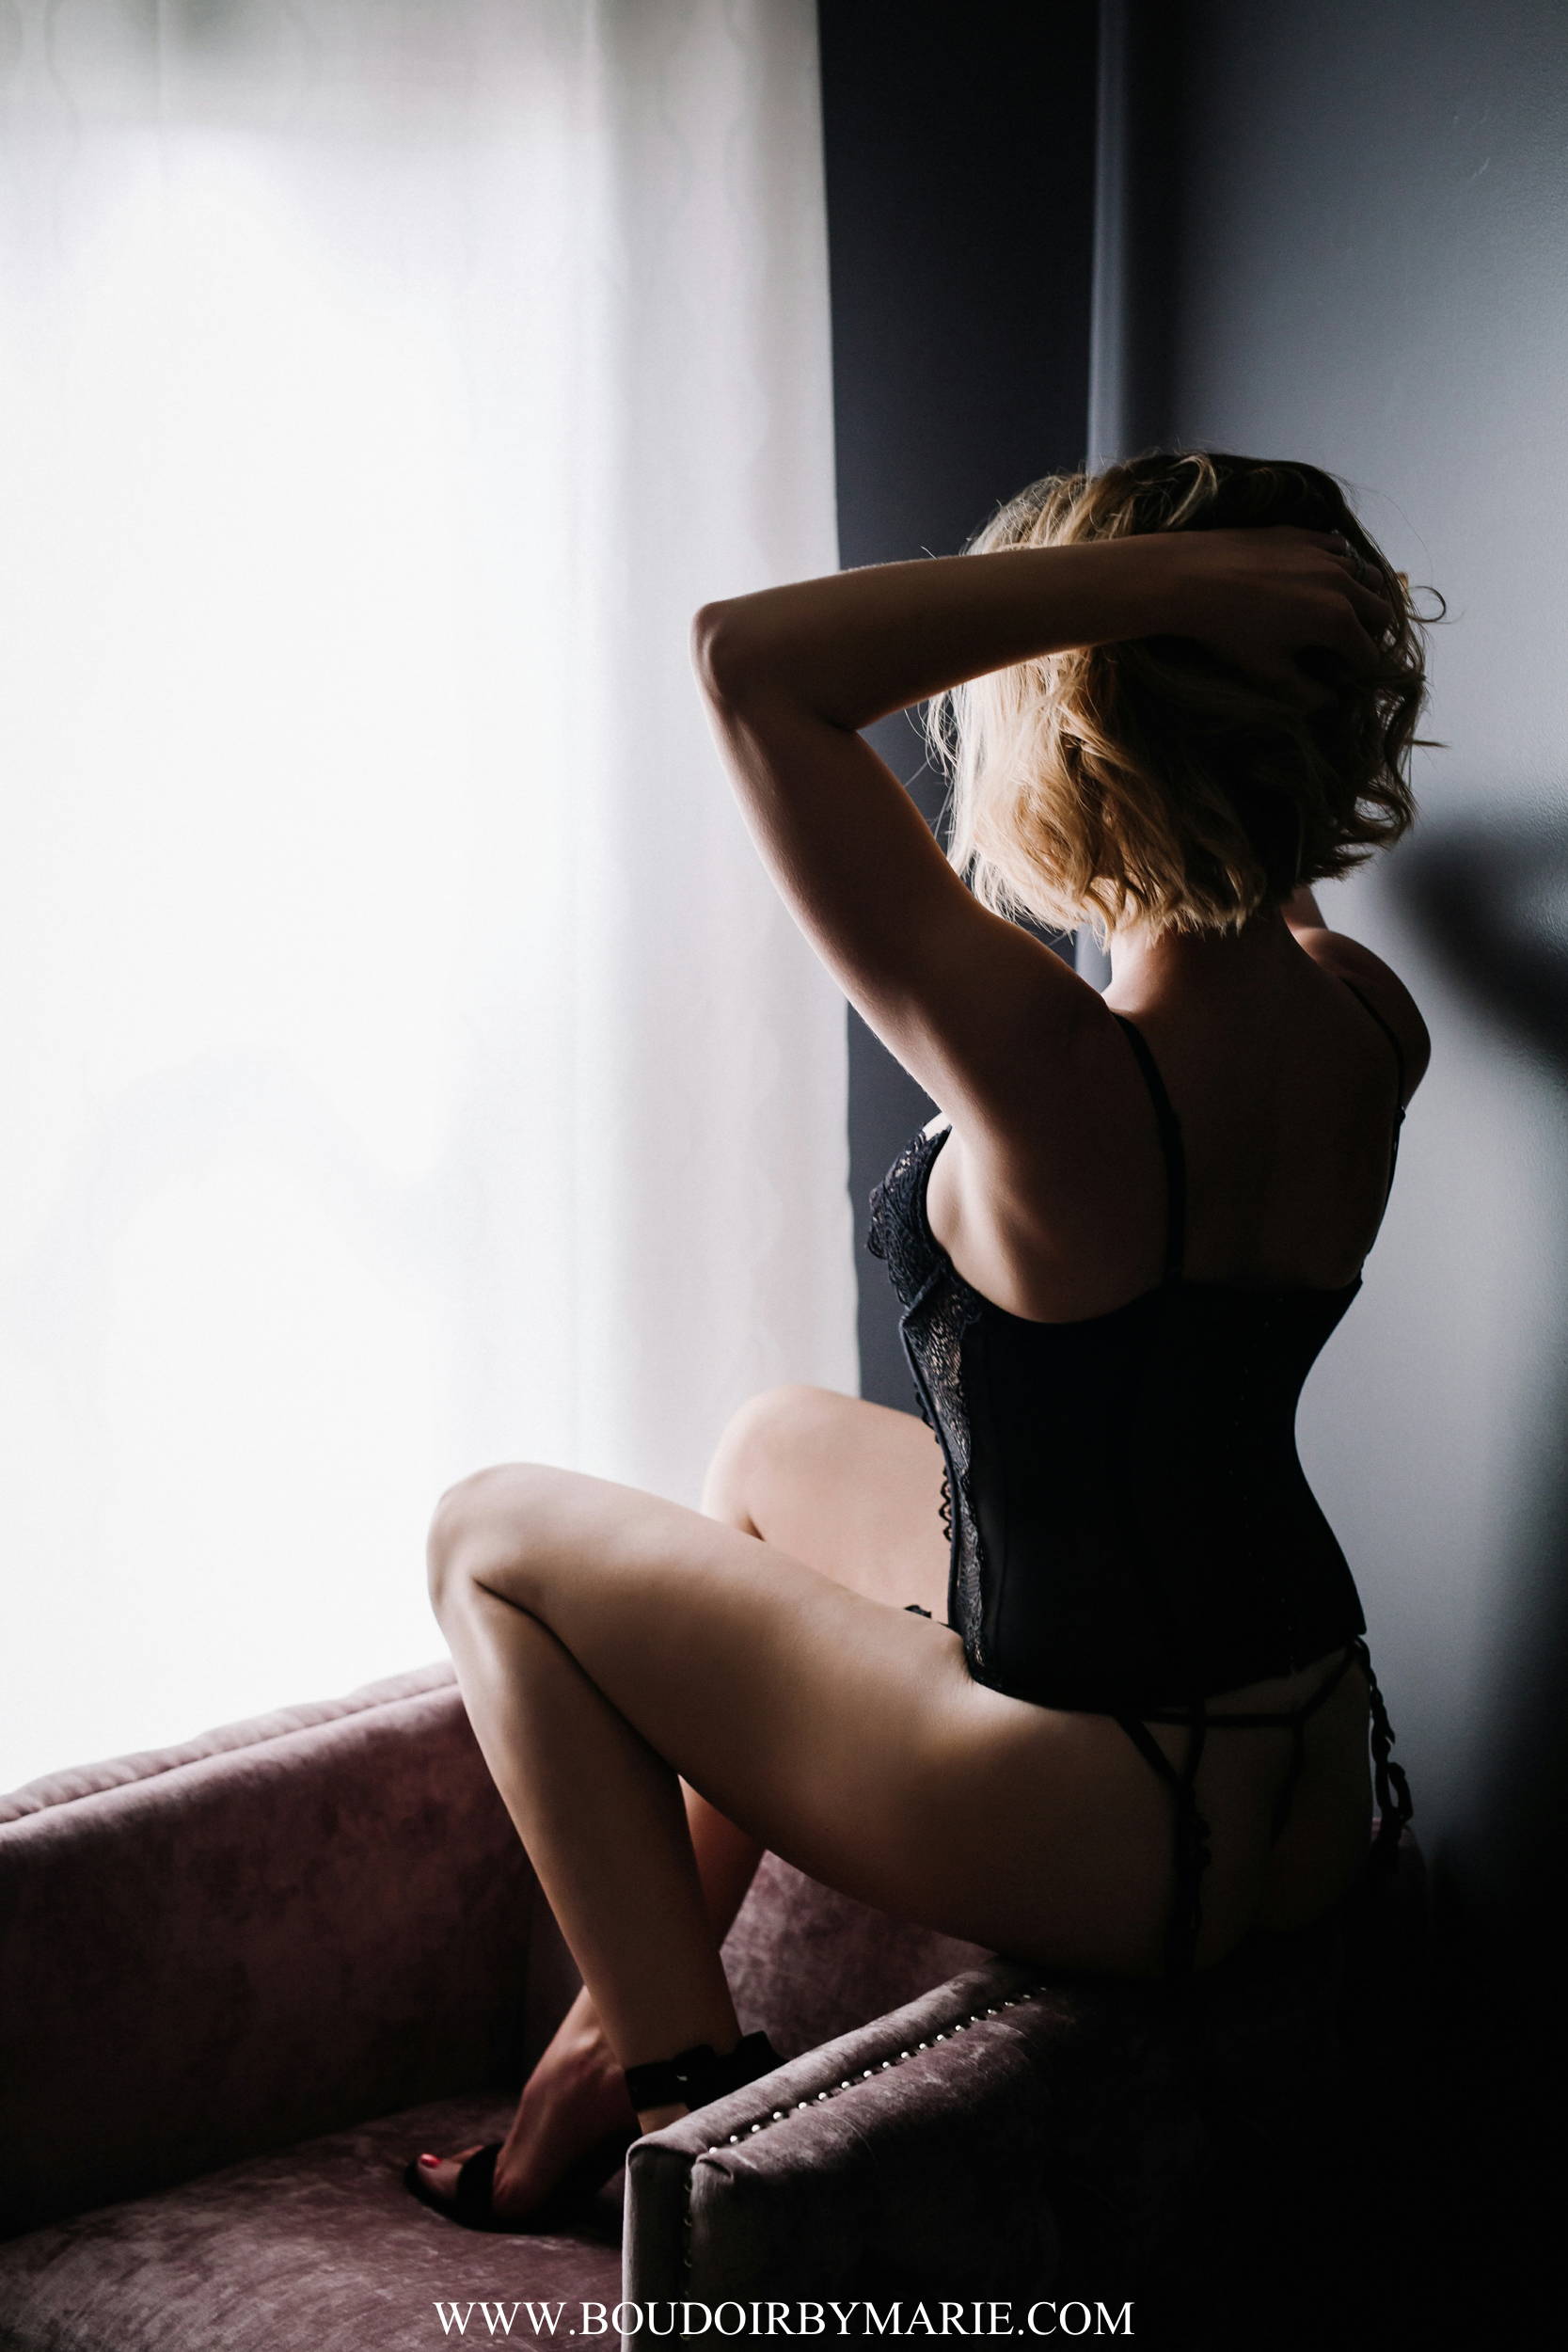 boudoirbymarie-MissT-1.jpg